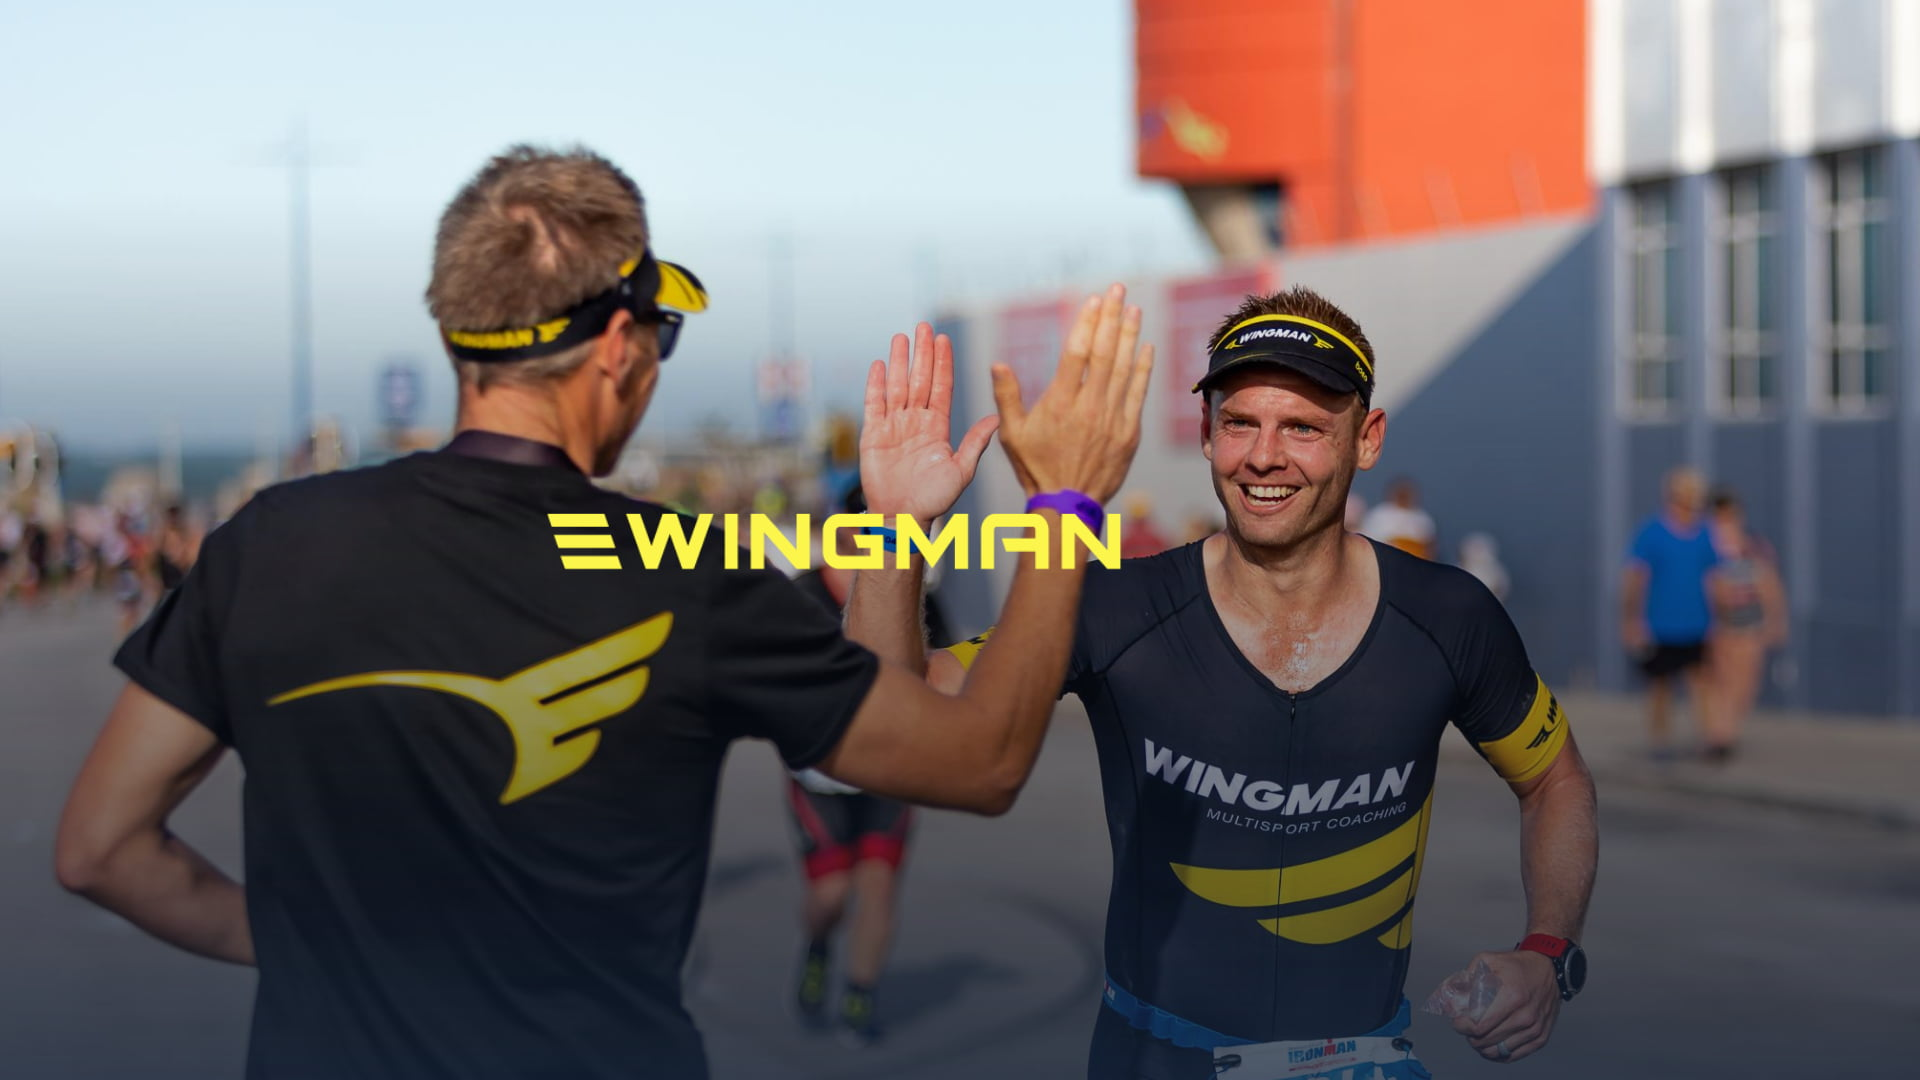 Interakt Client background - Wingman Multisport Coaching